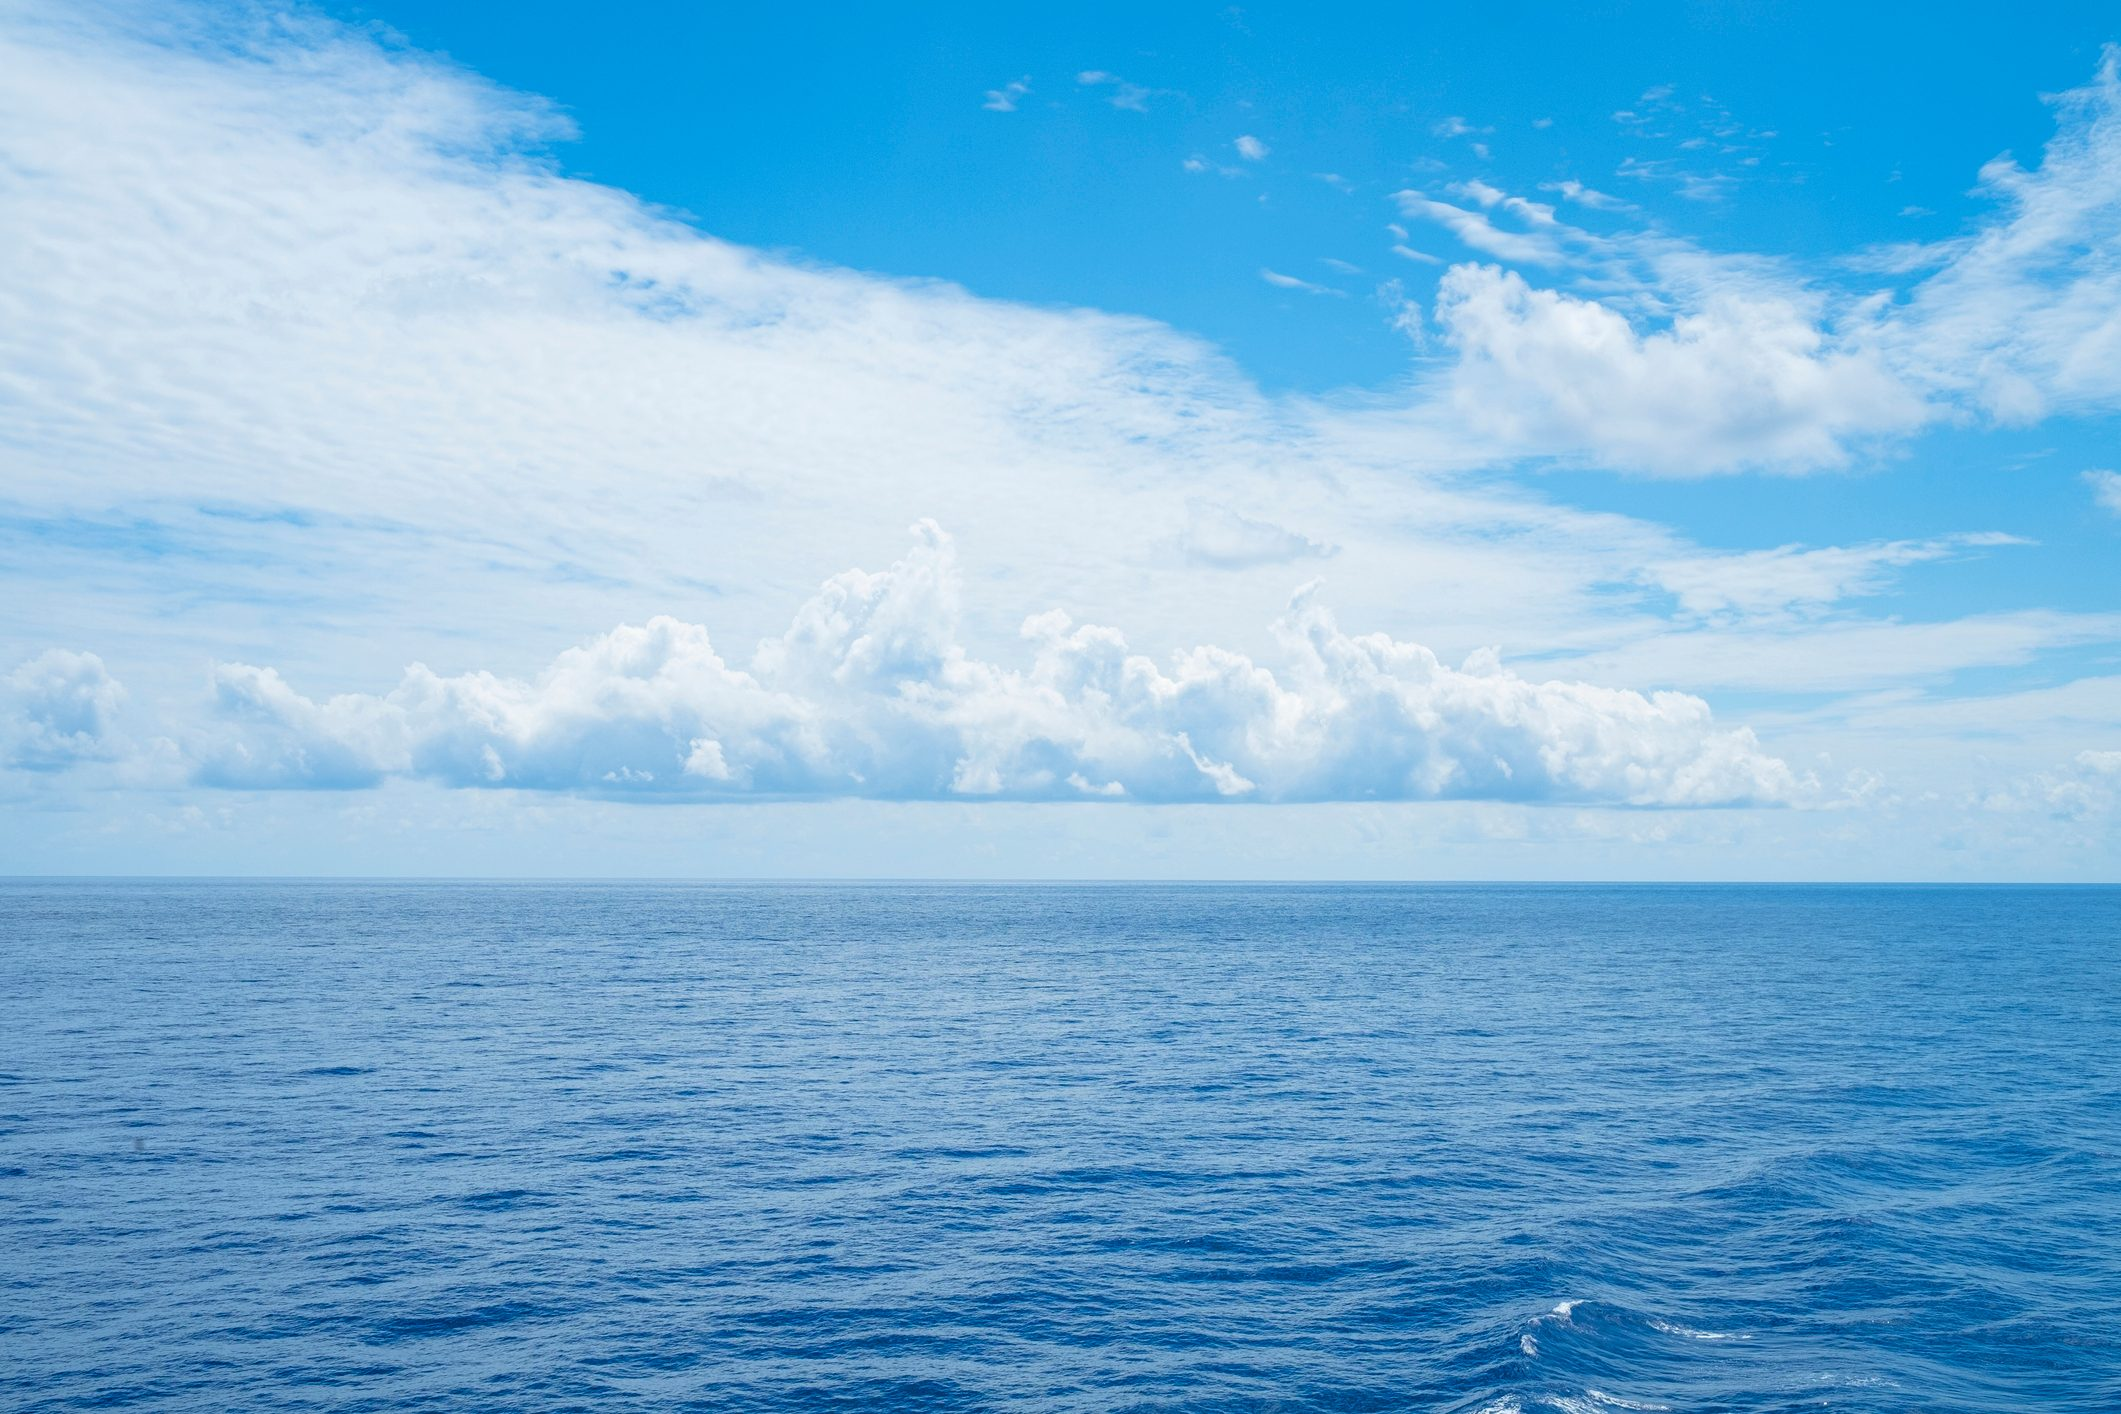 Calm Atlantic Ocean and Clouds off the Coast of Bermuda